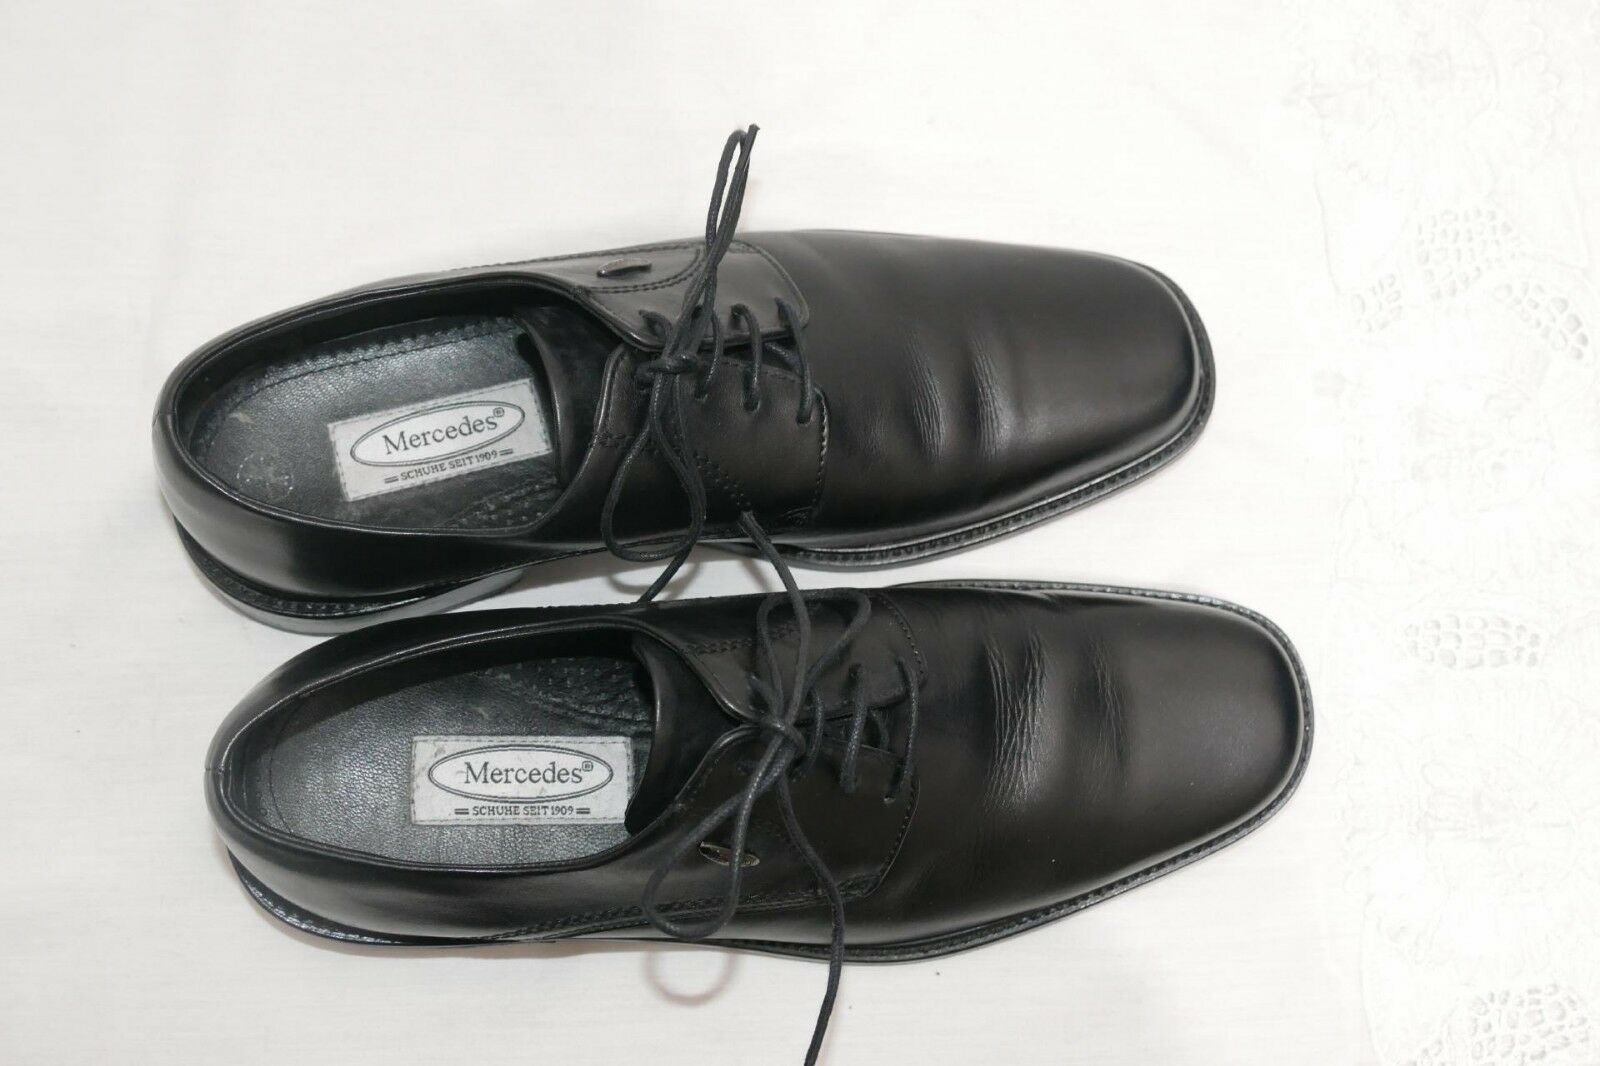 1088---Mercedes Herren Schnürer UK komplett 9 Gr 43 Leder komplett UK schwarz …wie neu… b05fb7